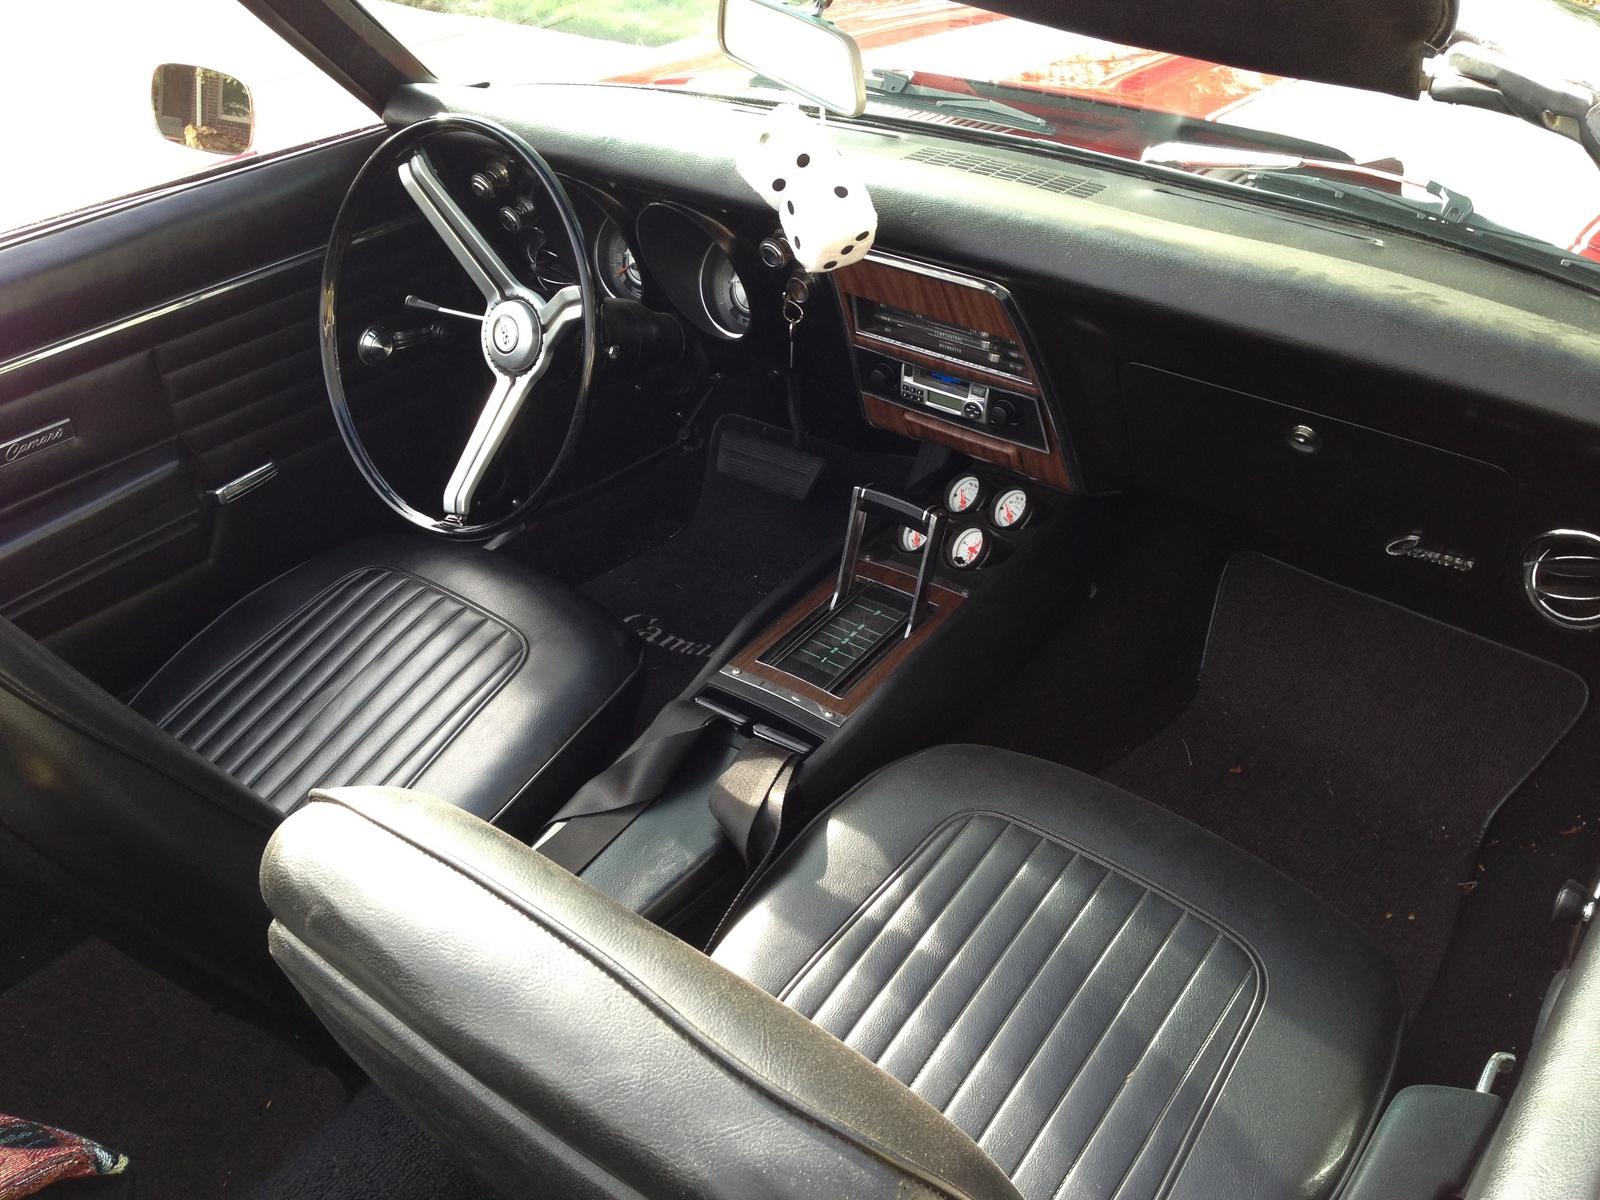 1968 camaro ss interior